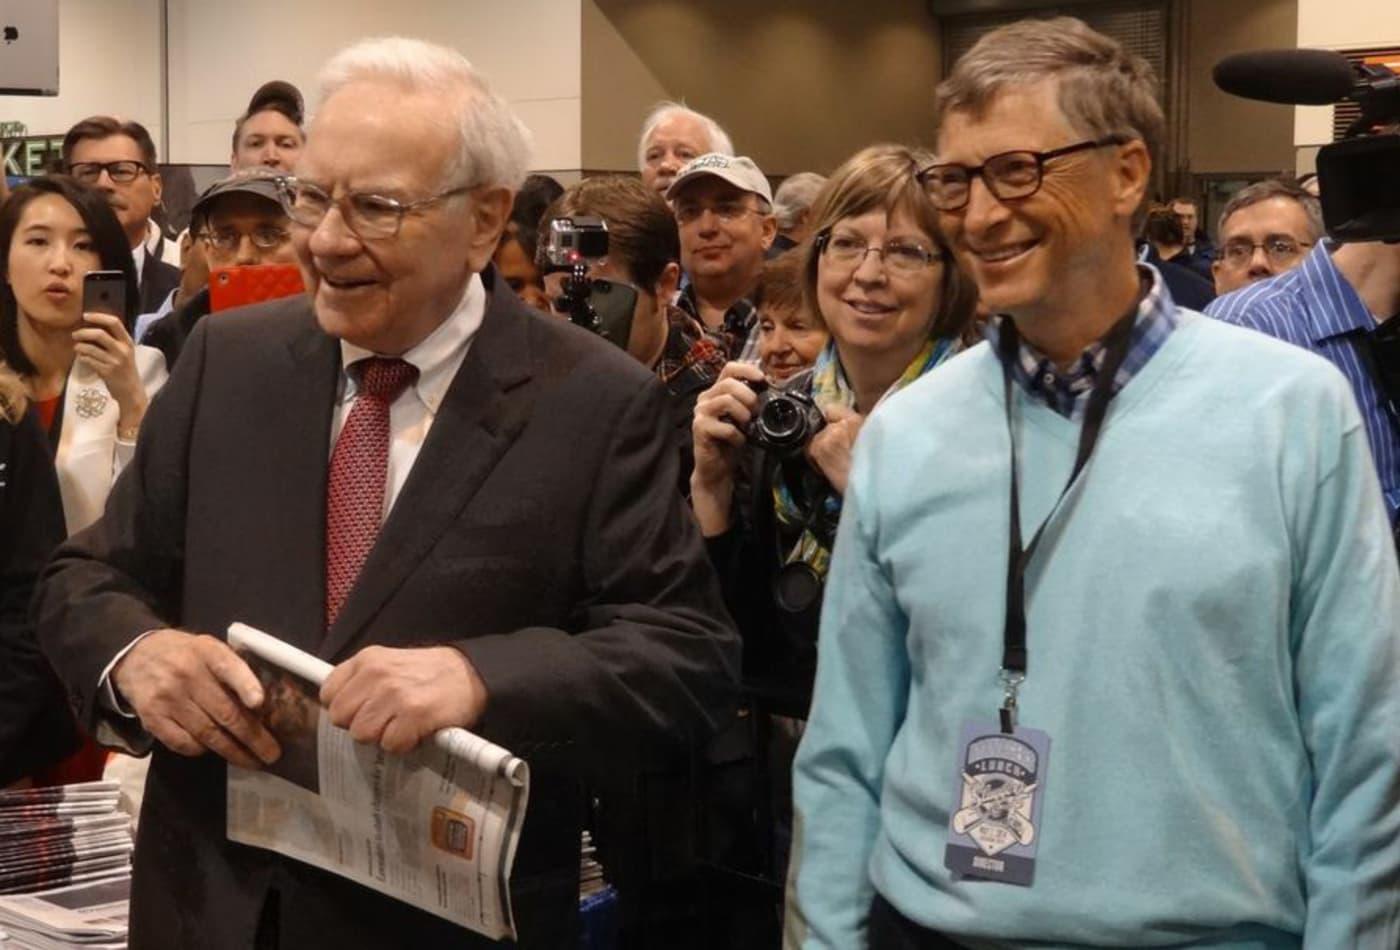 Warren Buffett, Bill Gates have similar ideas on how much